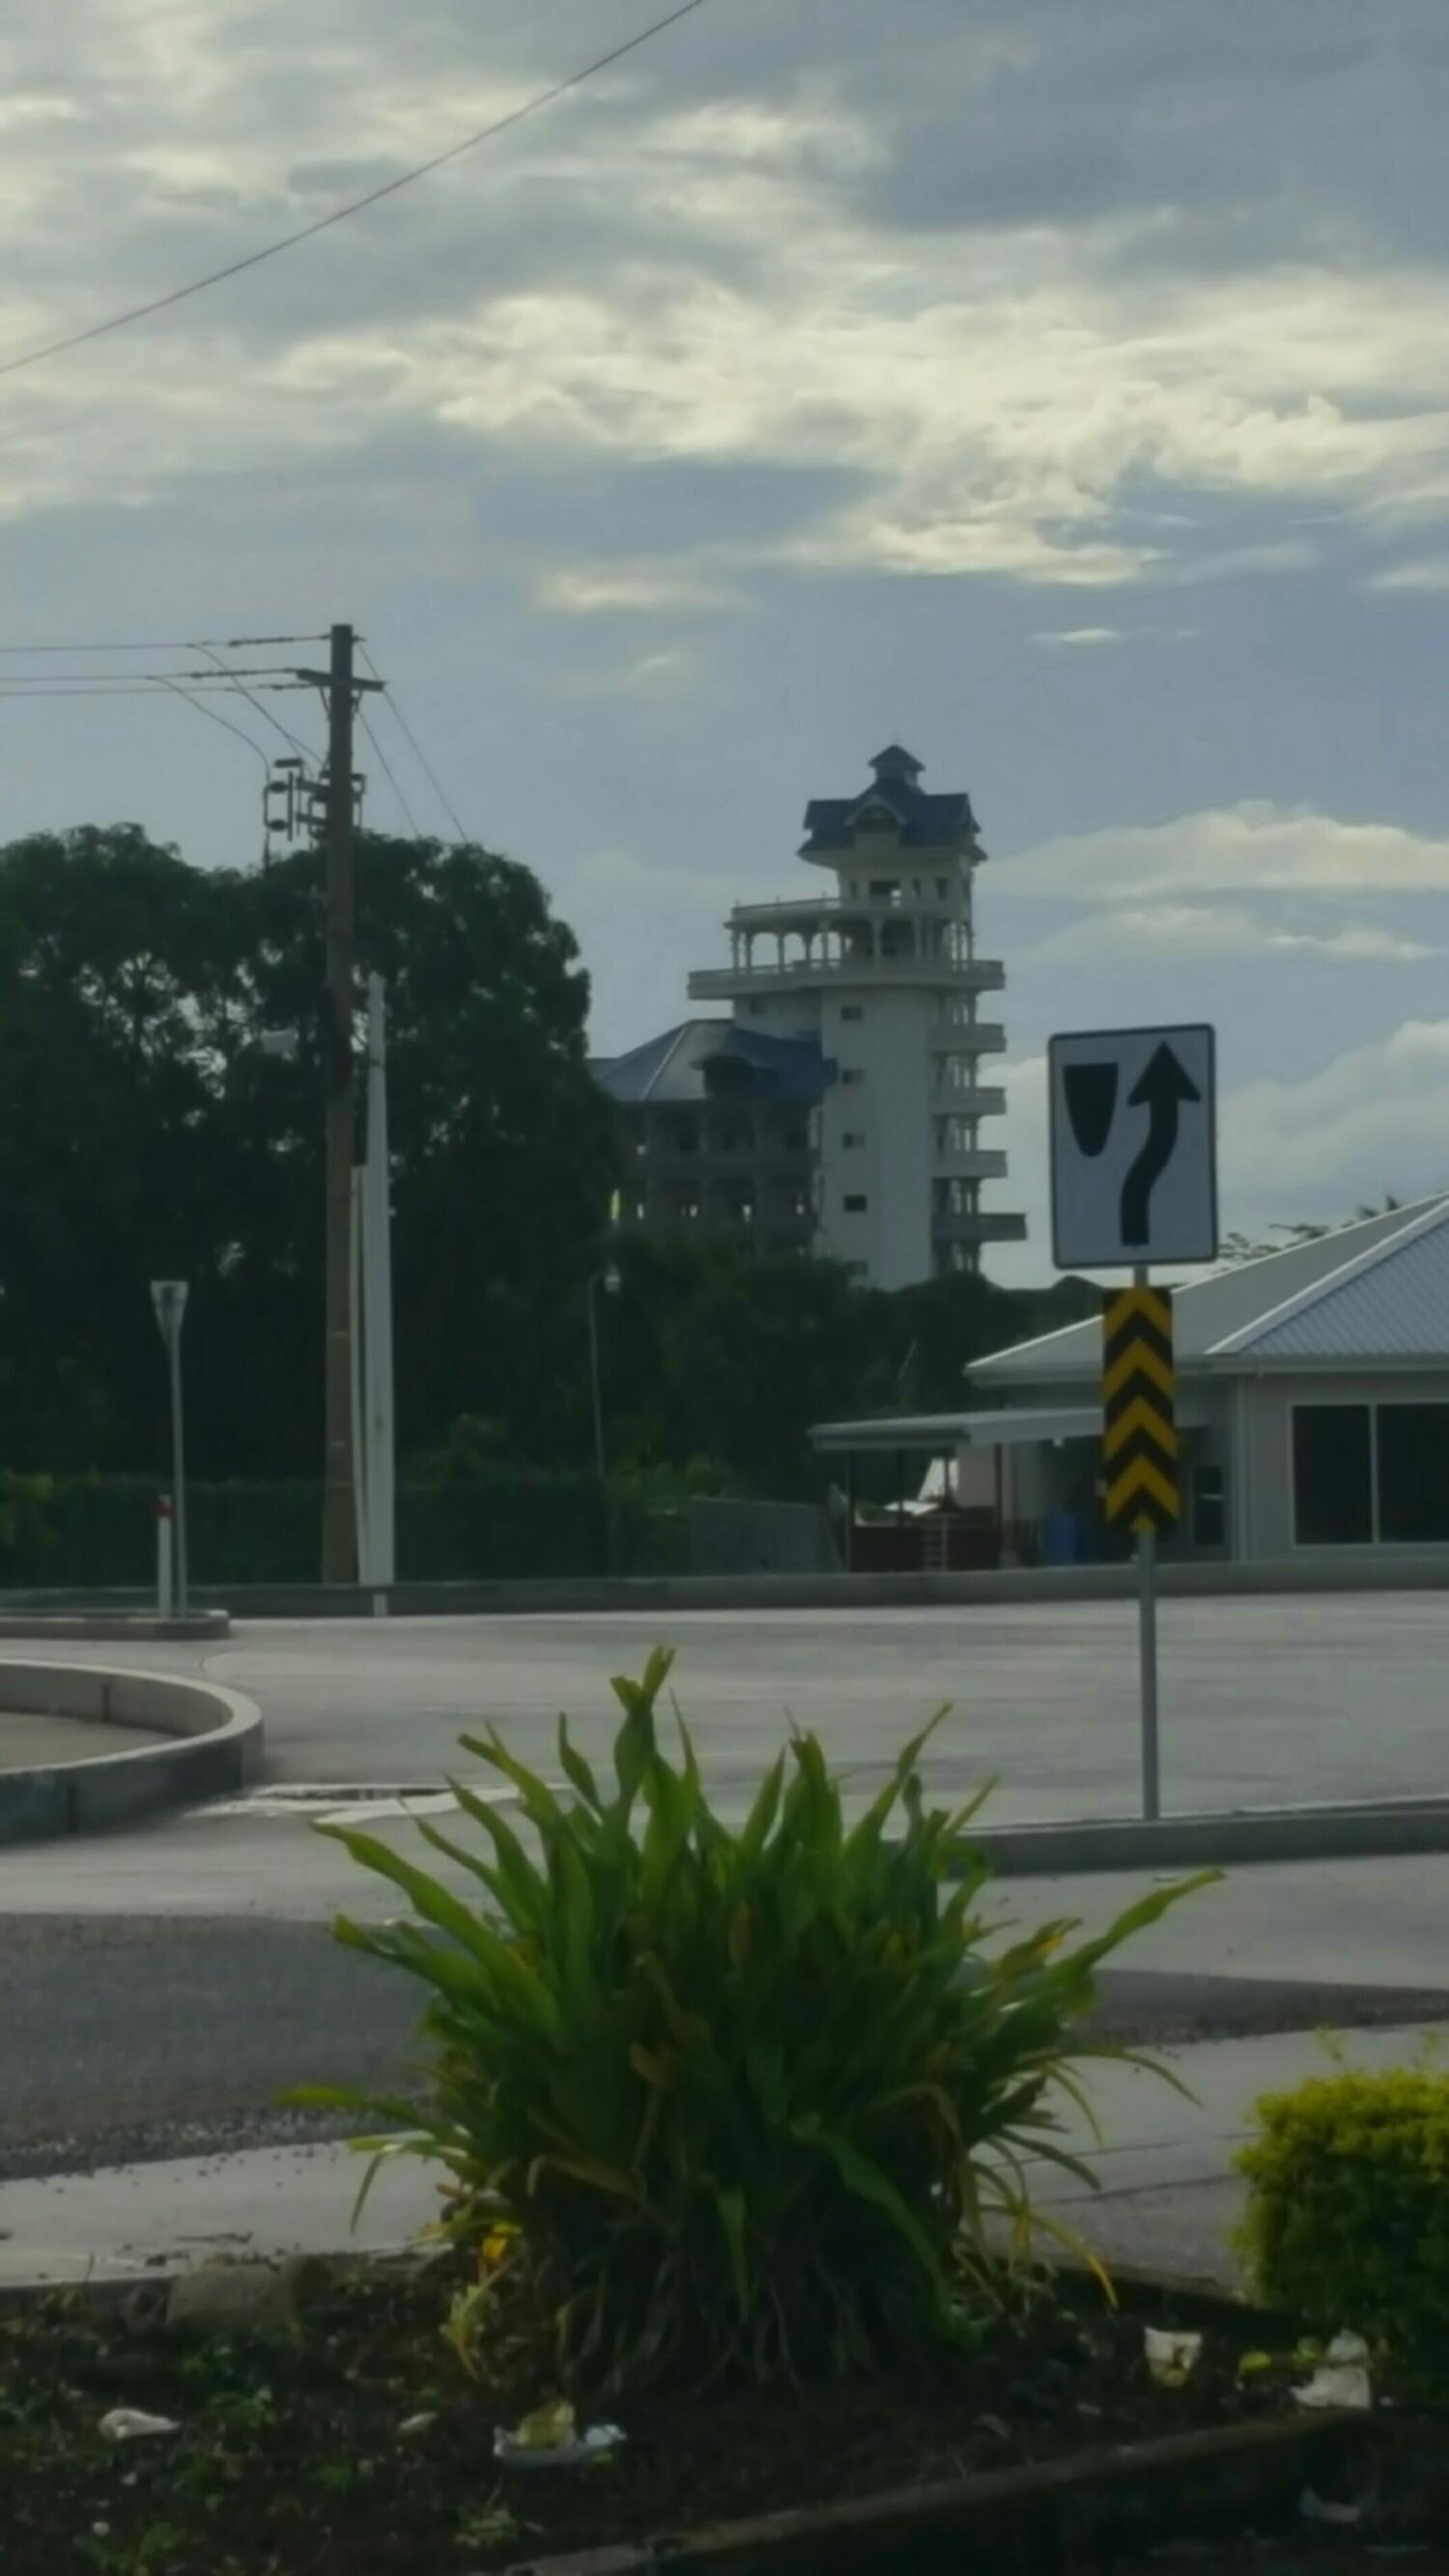 The tallest building in Belmopan, the capital of Belize, is a bit odd.